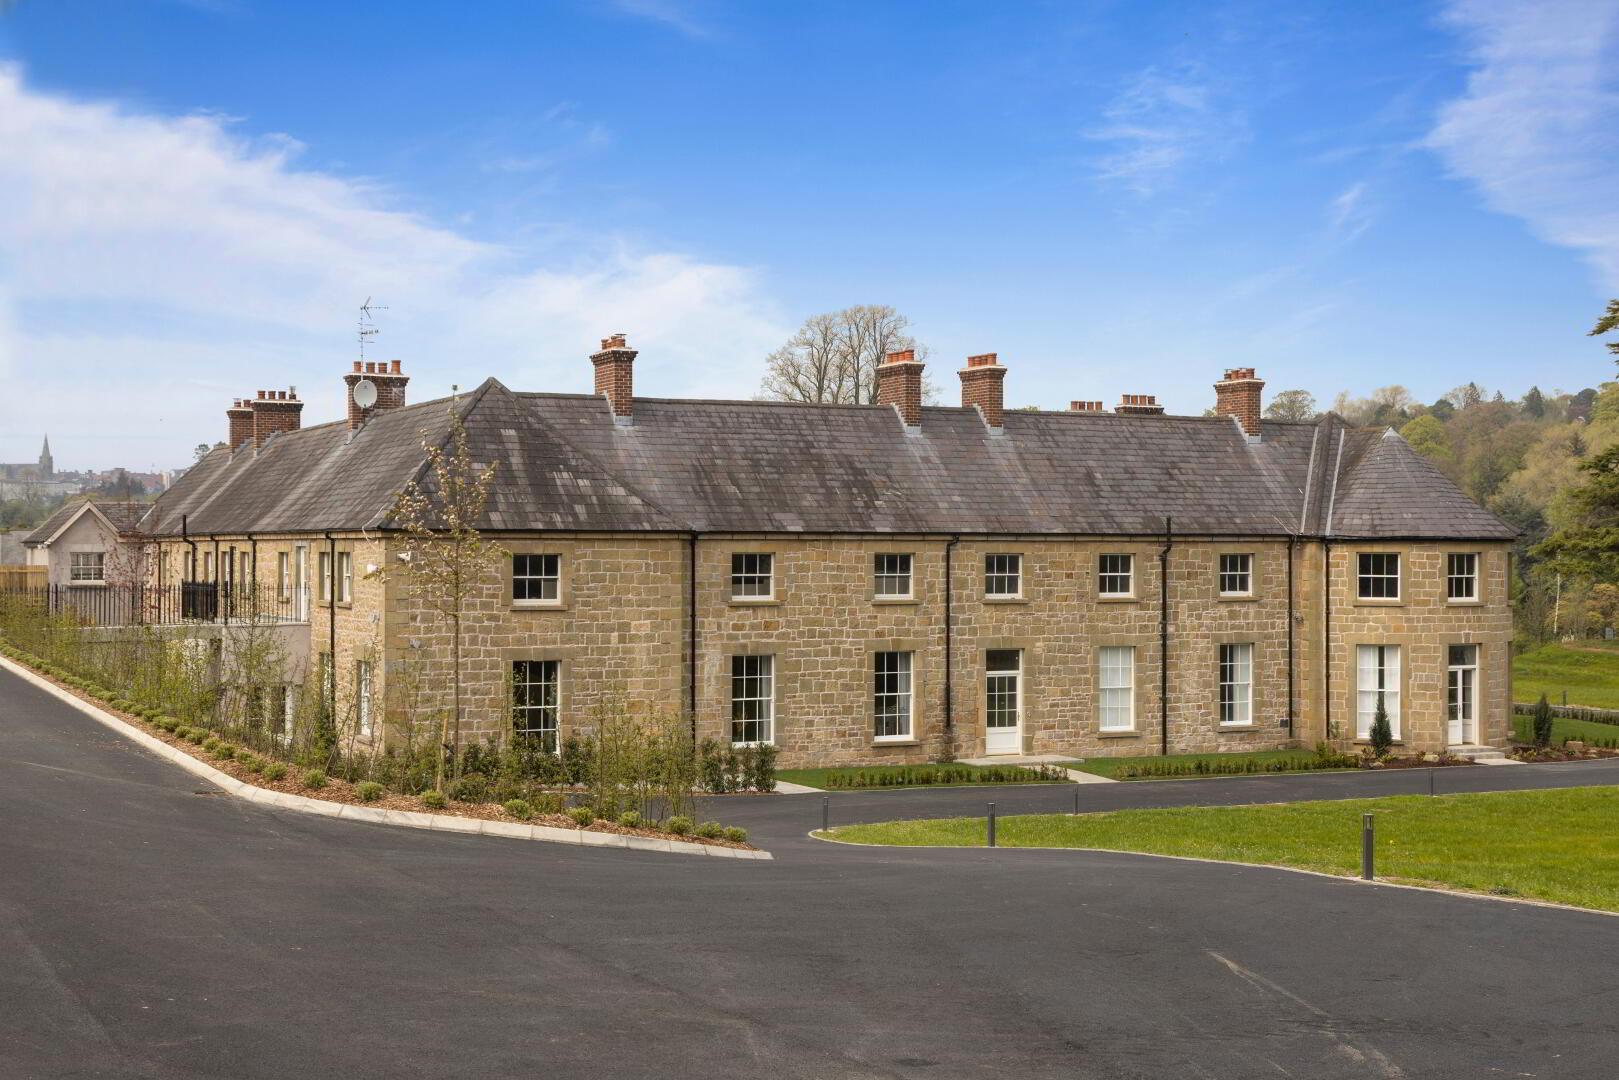 Photo 1 of The Demesne, Ballynorthland Manor, Ballynorthland Demesne, Dungannon